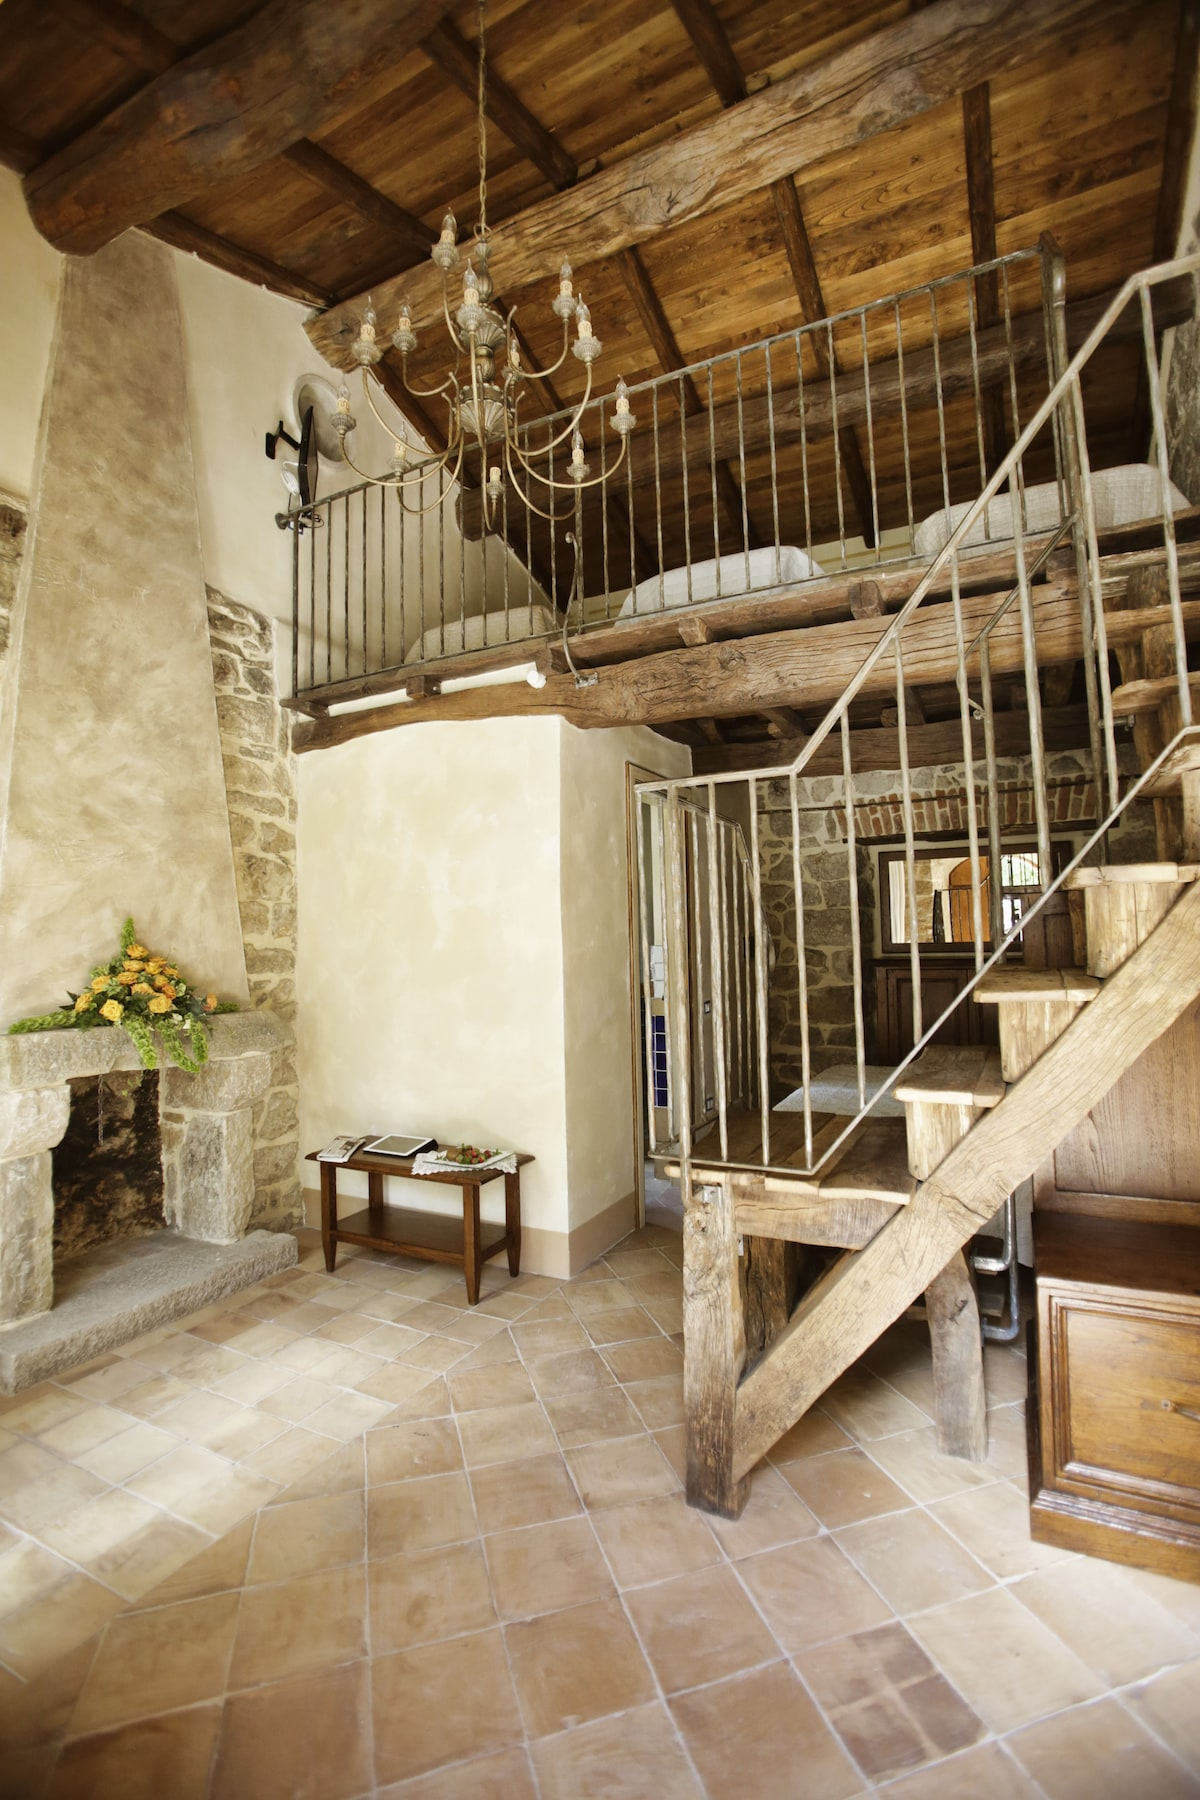 Ruspante Hostelry, Bastiano room